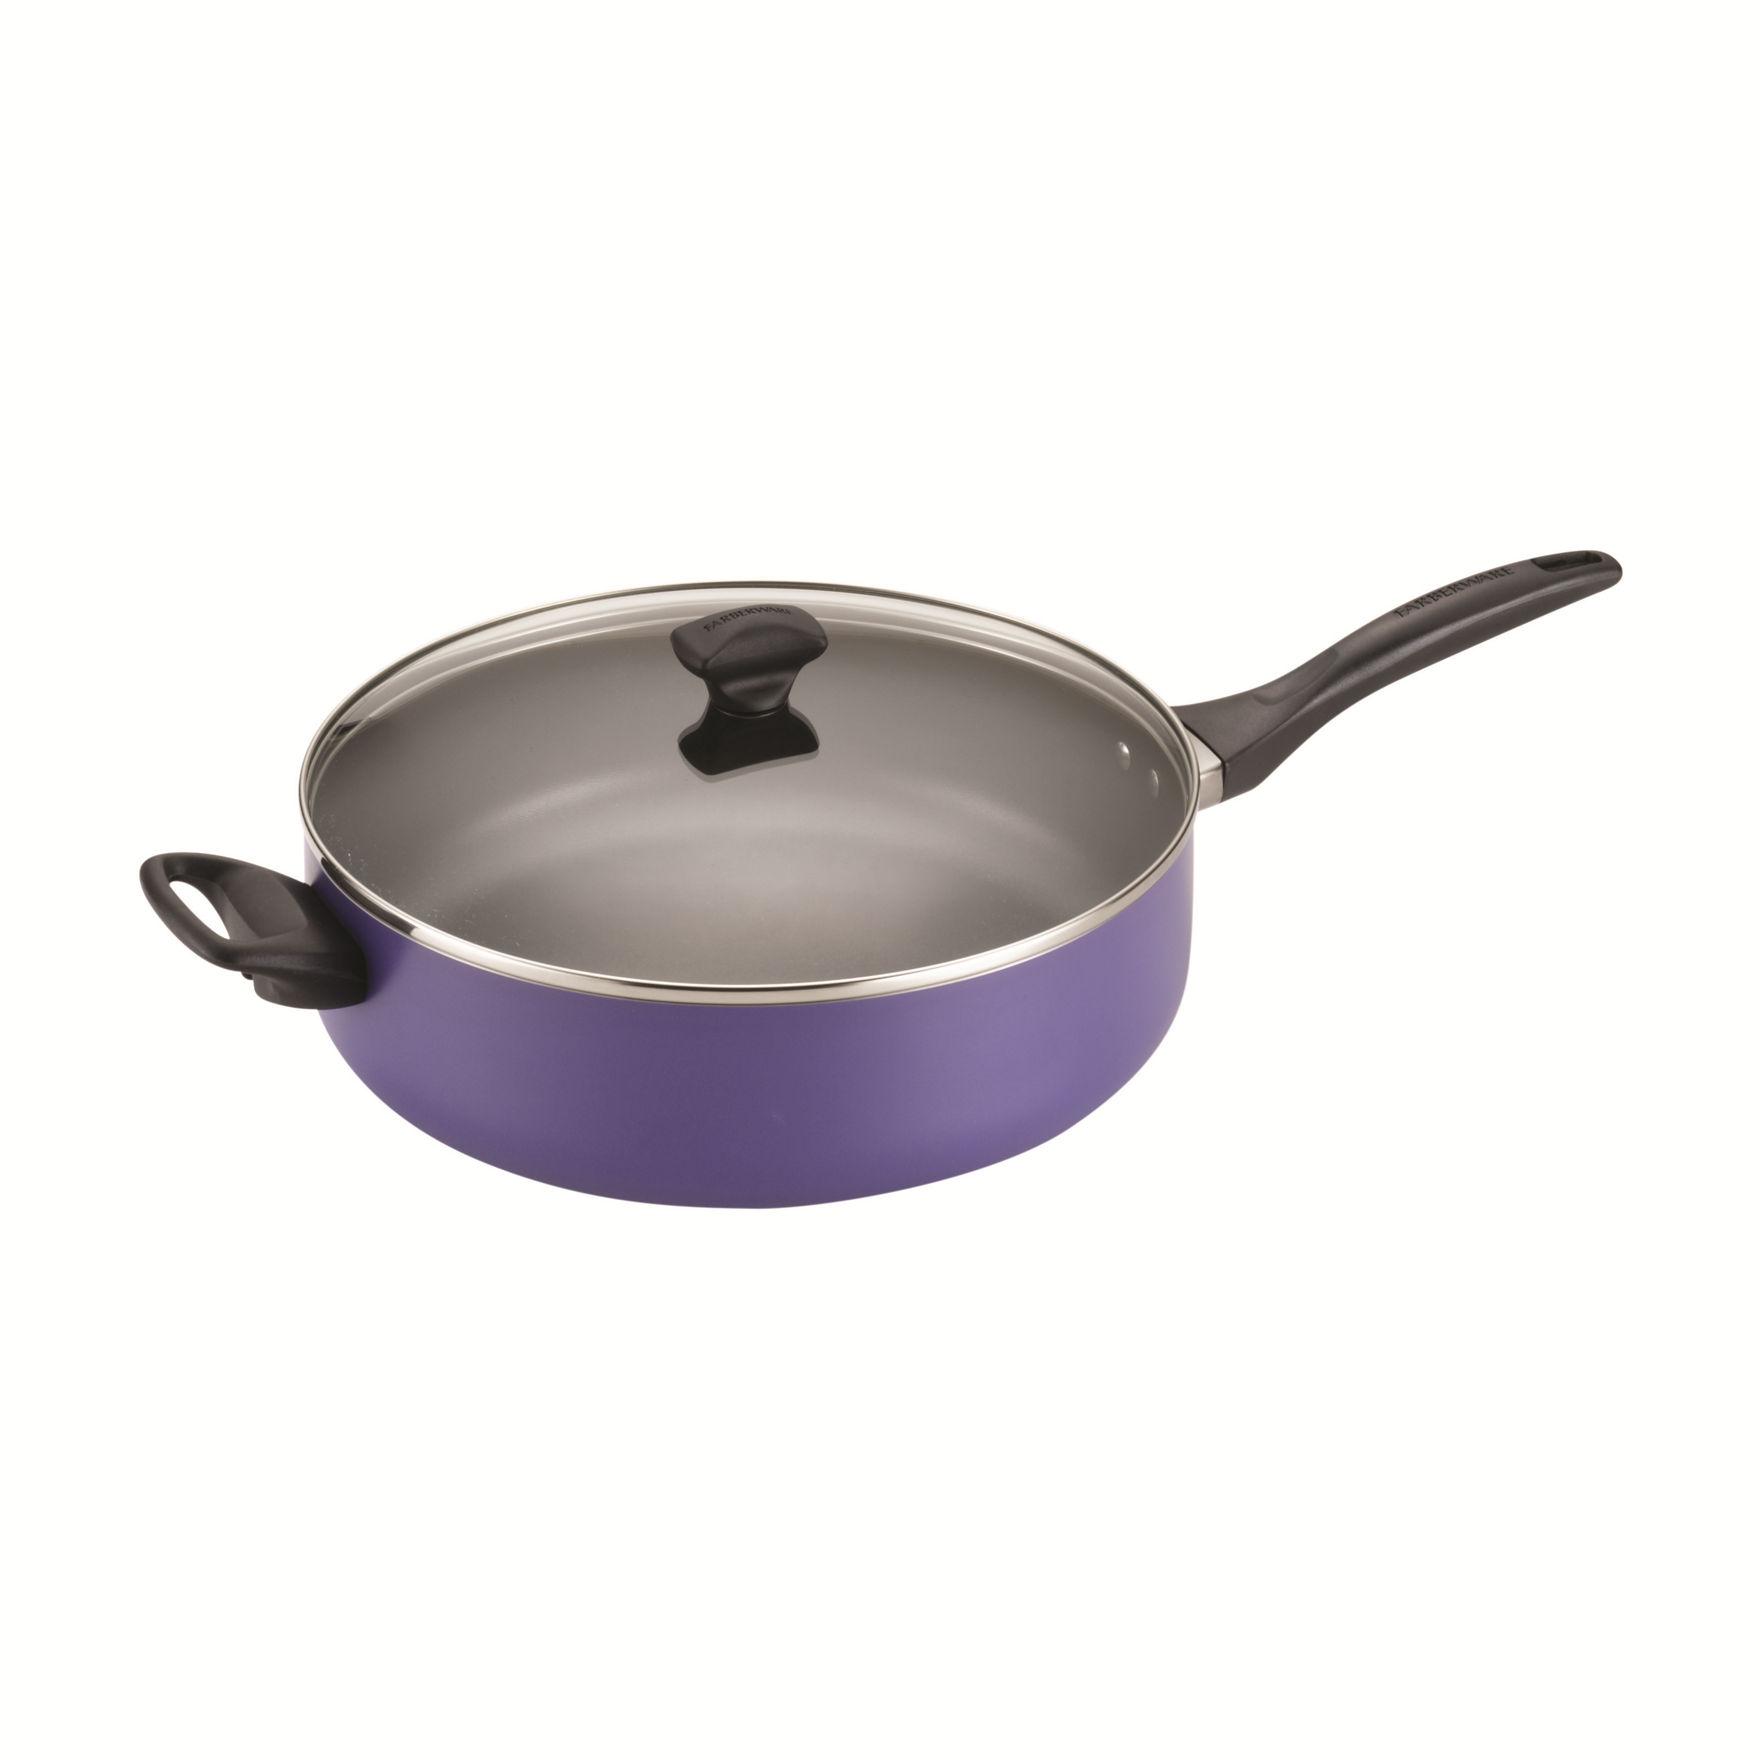 Farberware Purple Pots & Dutch Ovens Cookware